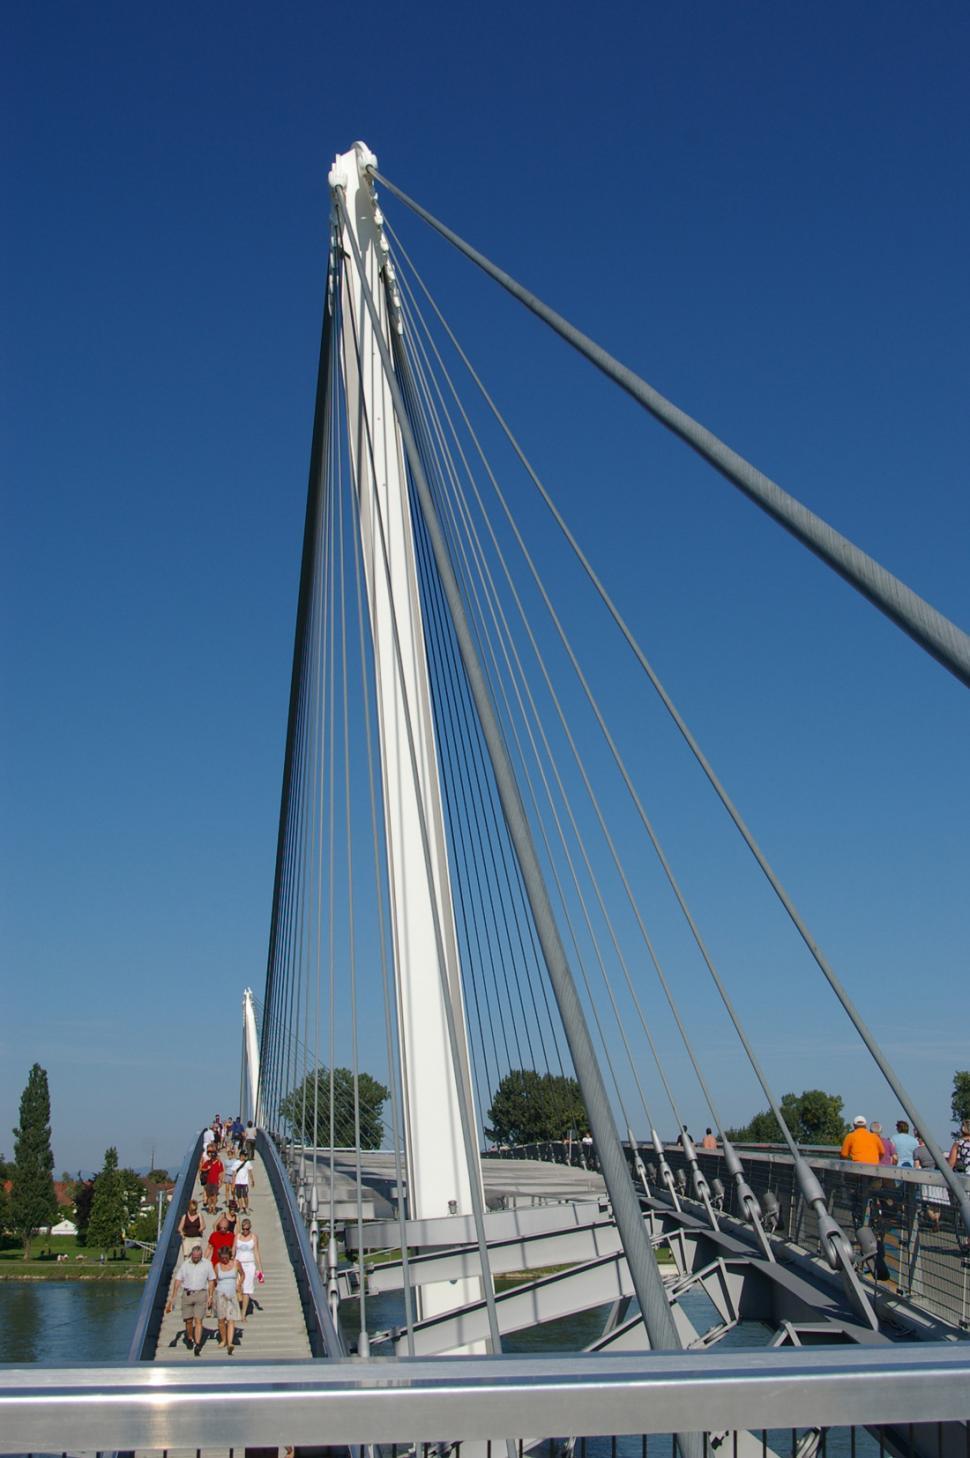 Download Free Stock Photo of Mimram bridge